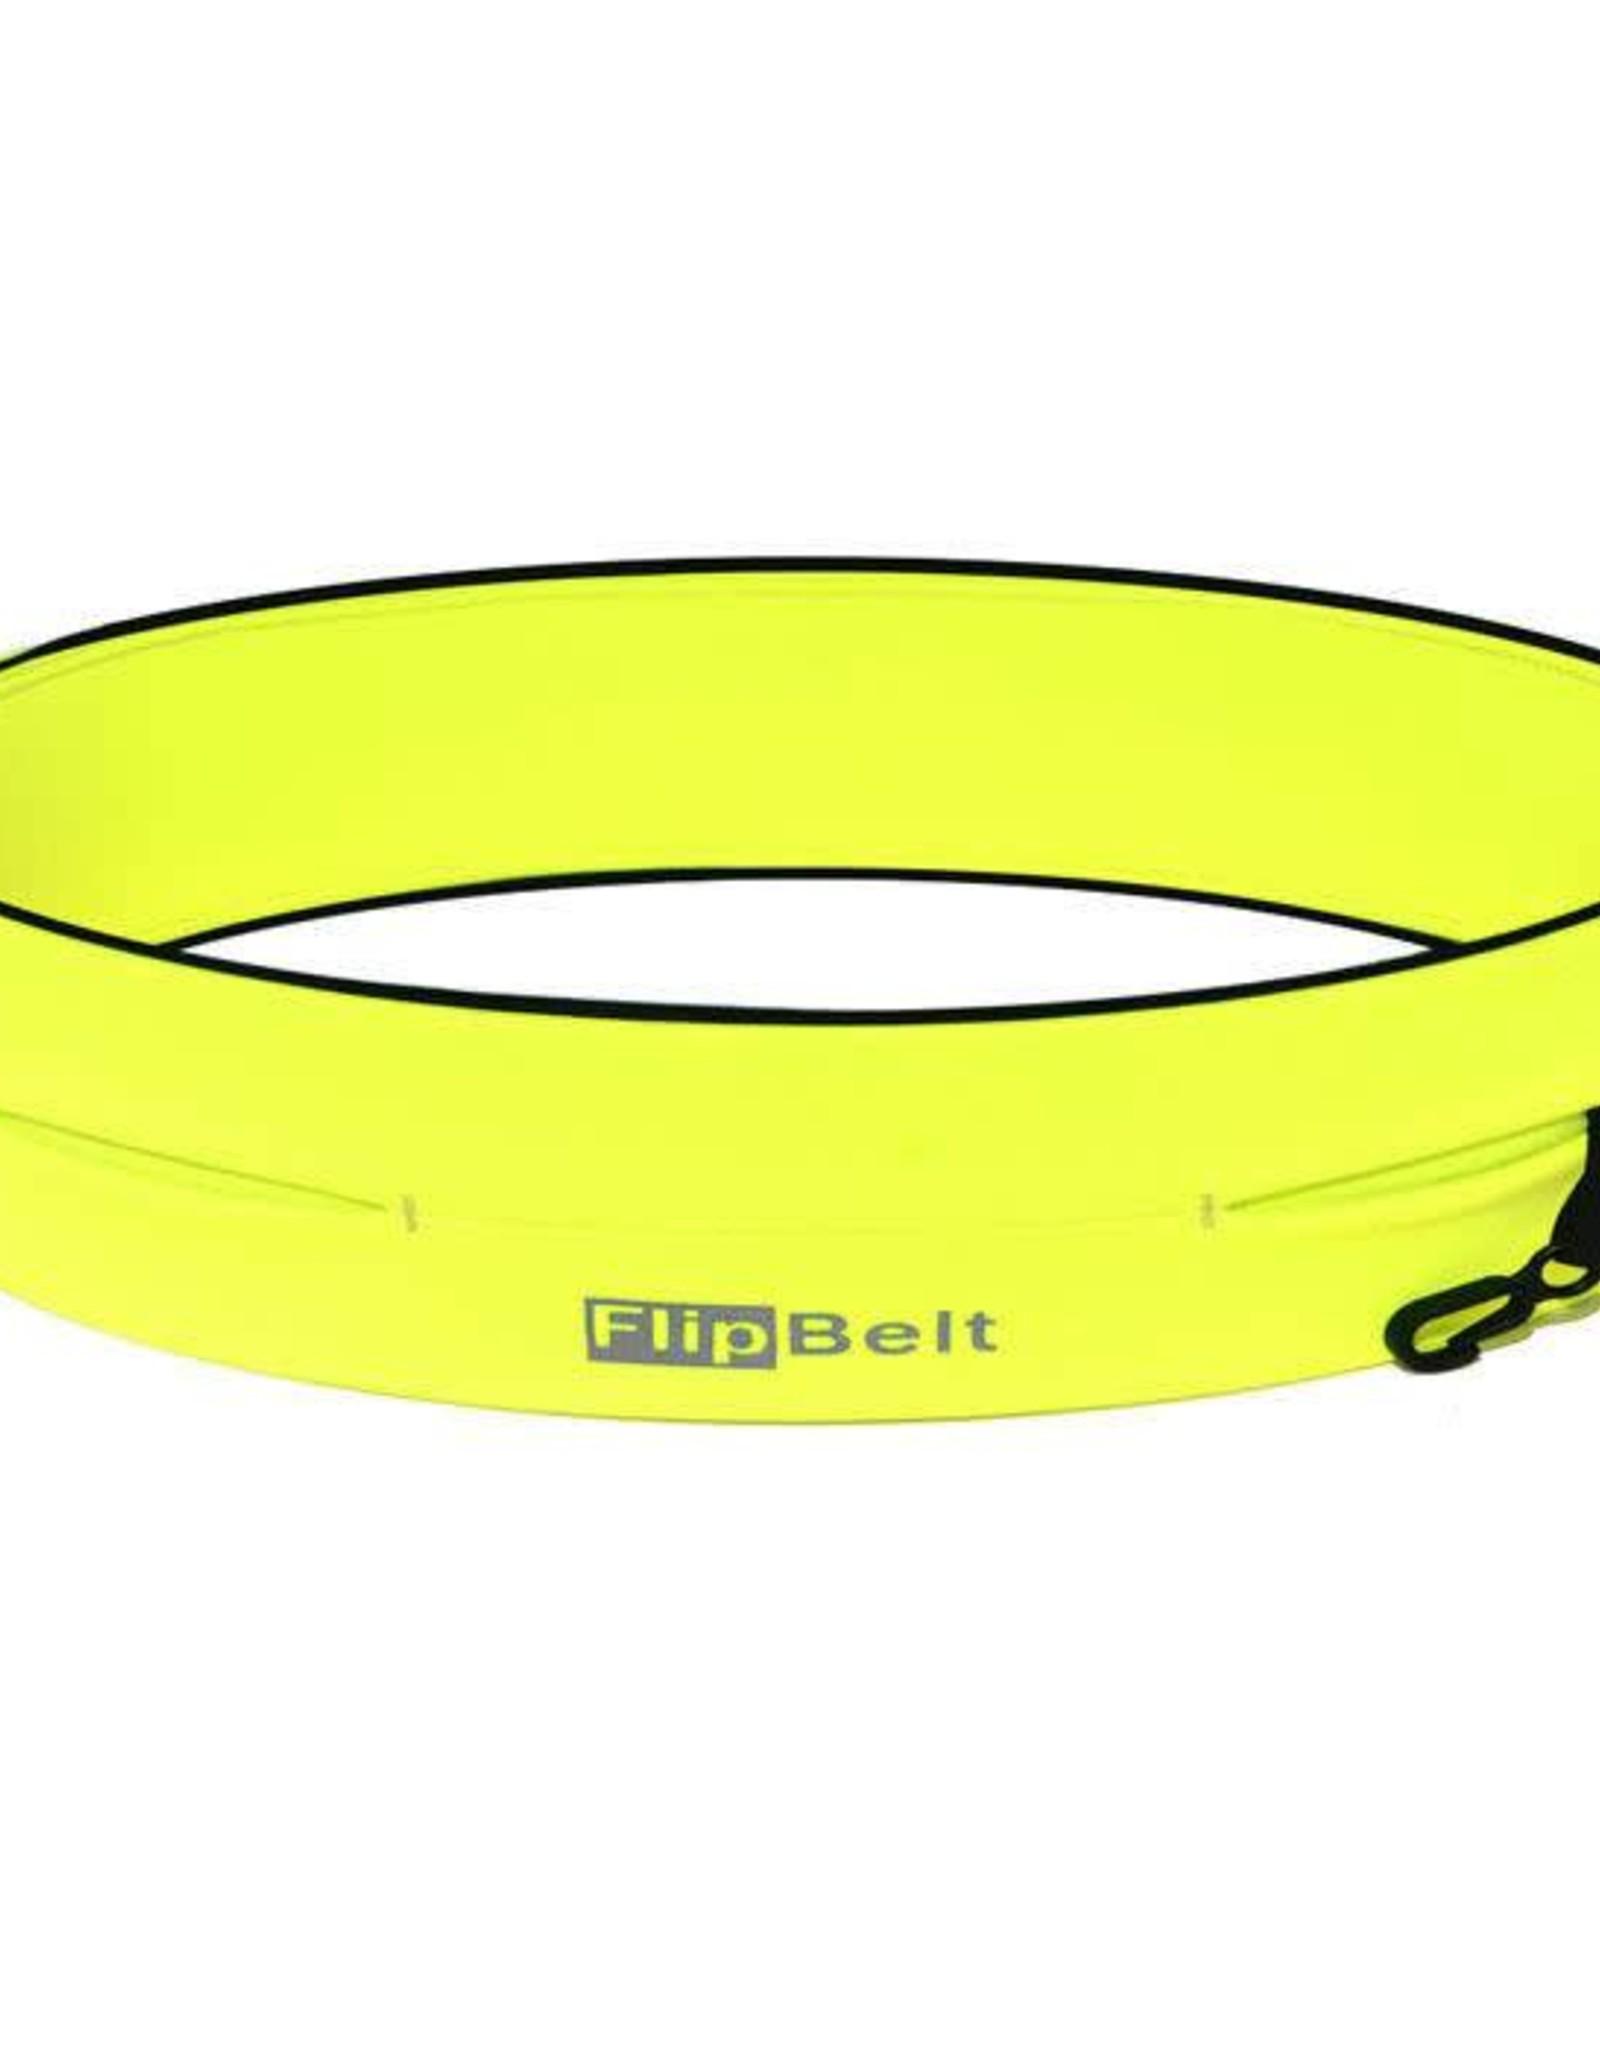 FlipBelt | V1.1 Nuclear Yellow - XS EXTRA SMALL | FB0114-NEOY-XS